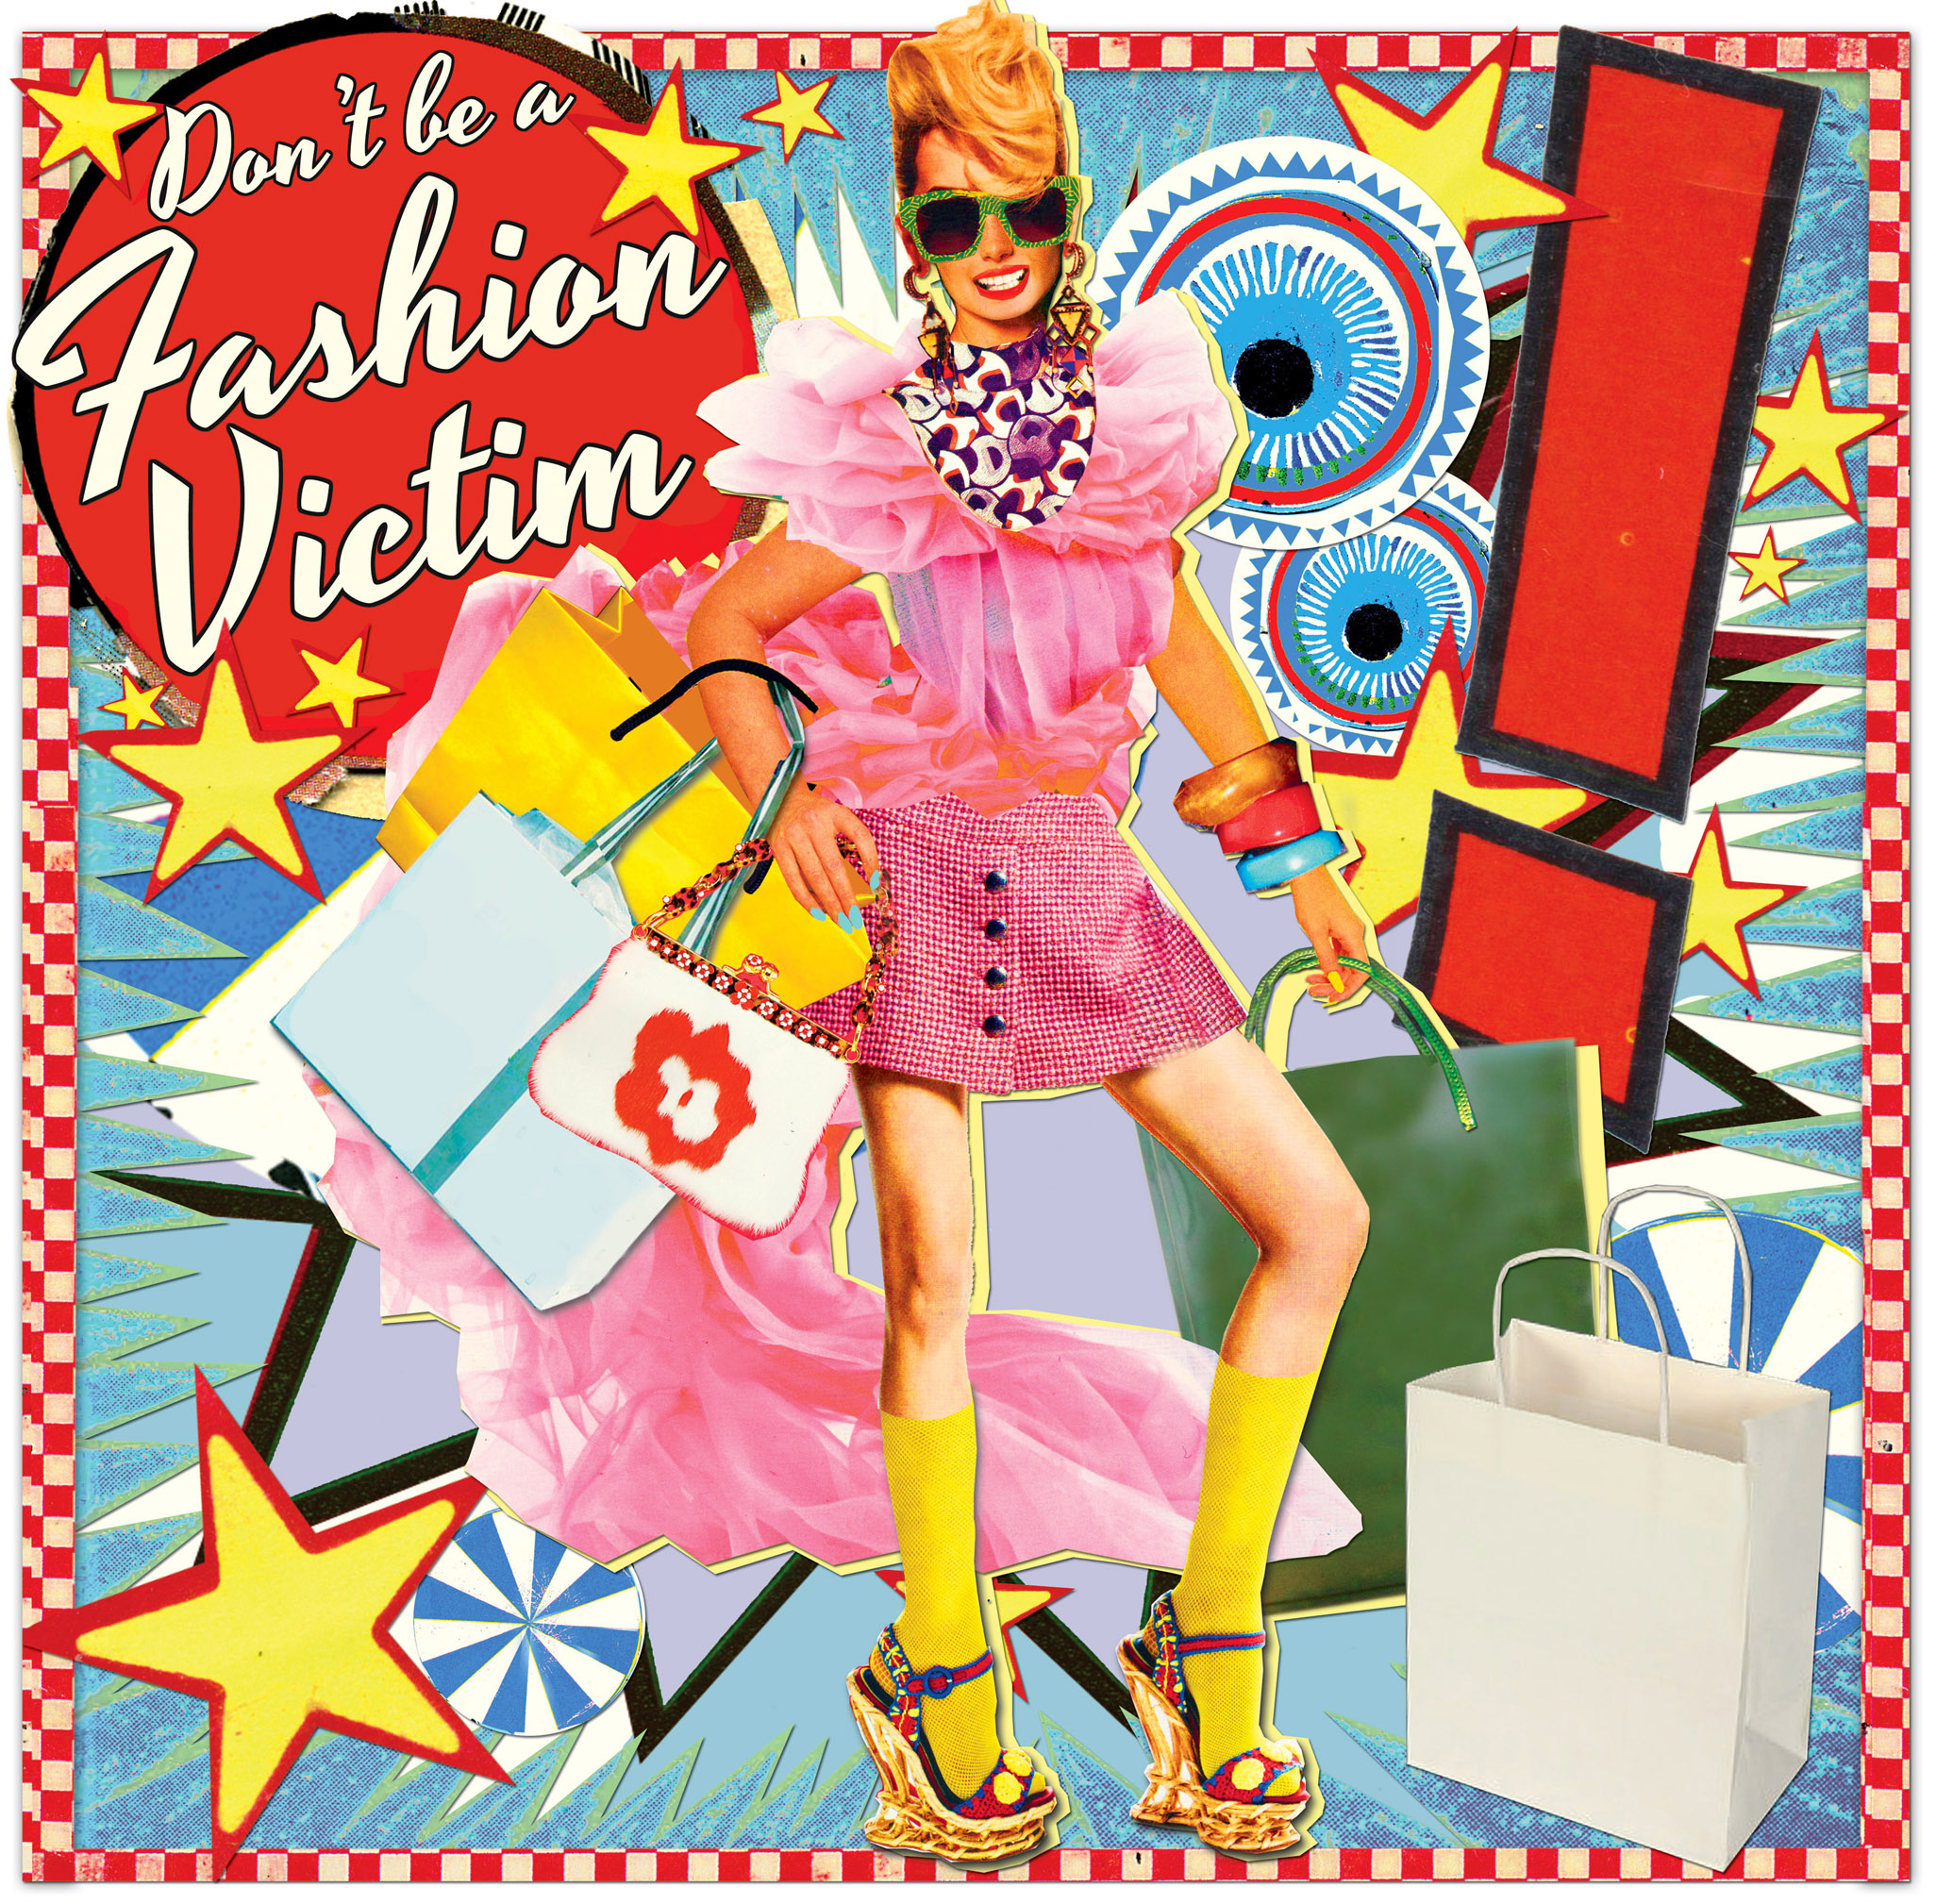 Wall Street Journal / Fashion Victim